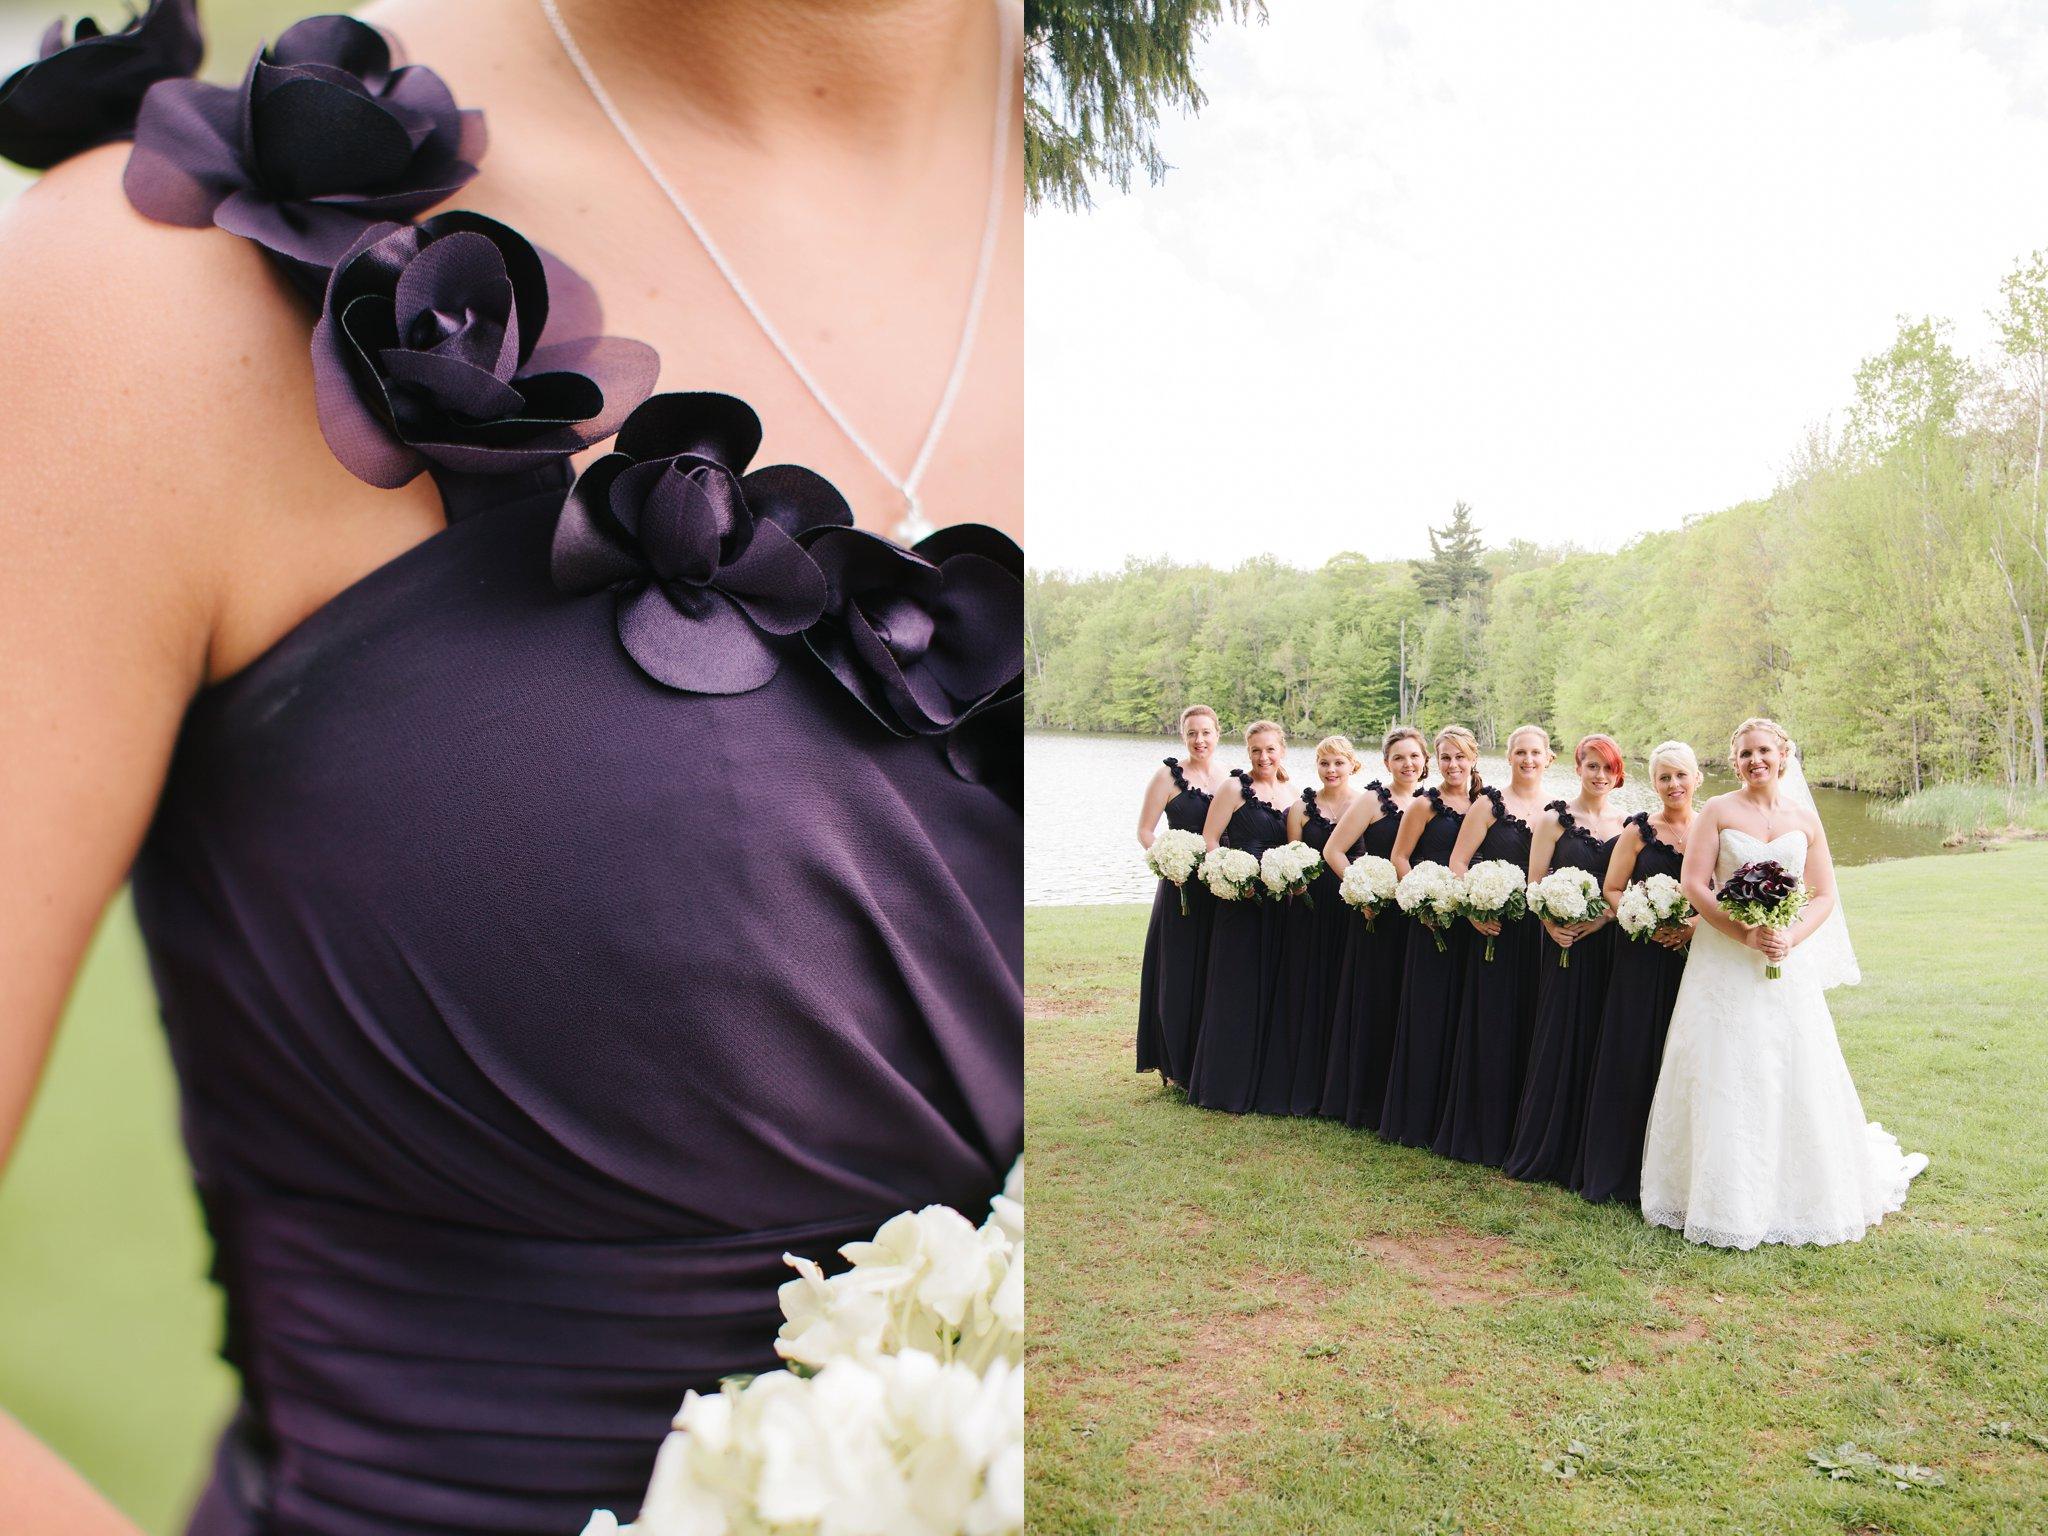 montdale_country_club_wedding_photos_photographer_scranton_pa7046.jpg